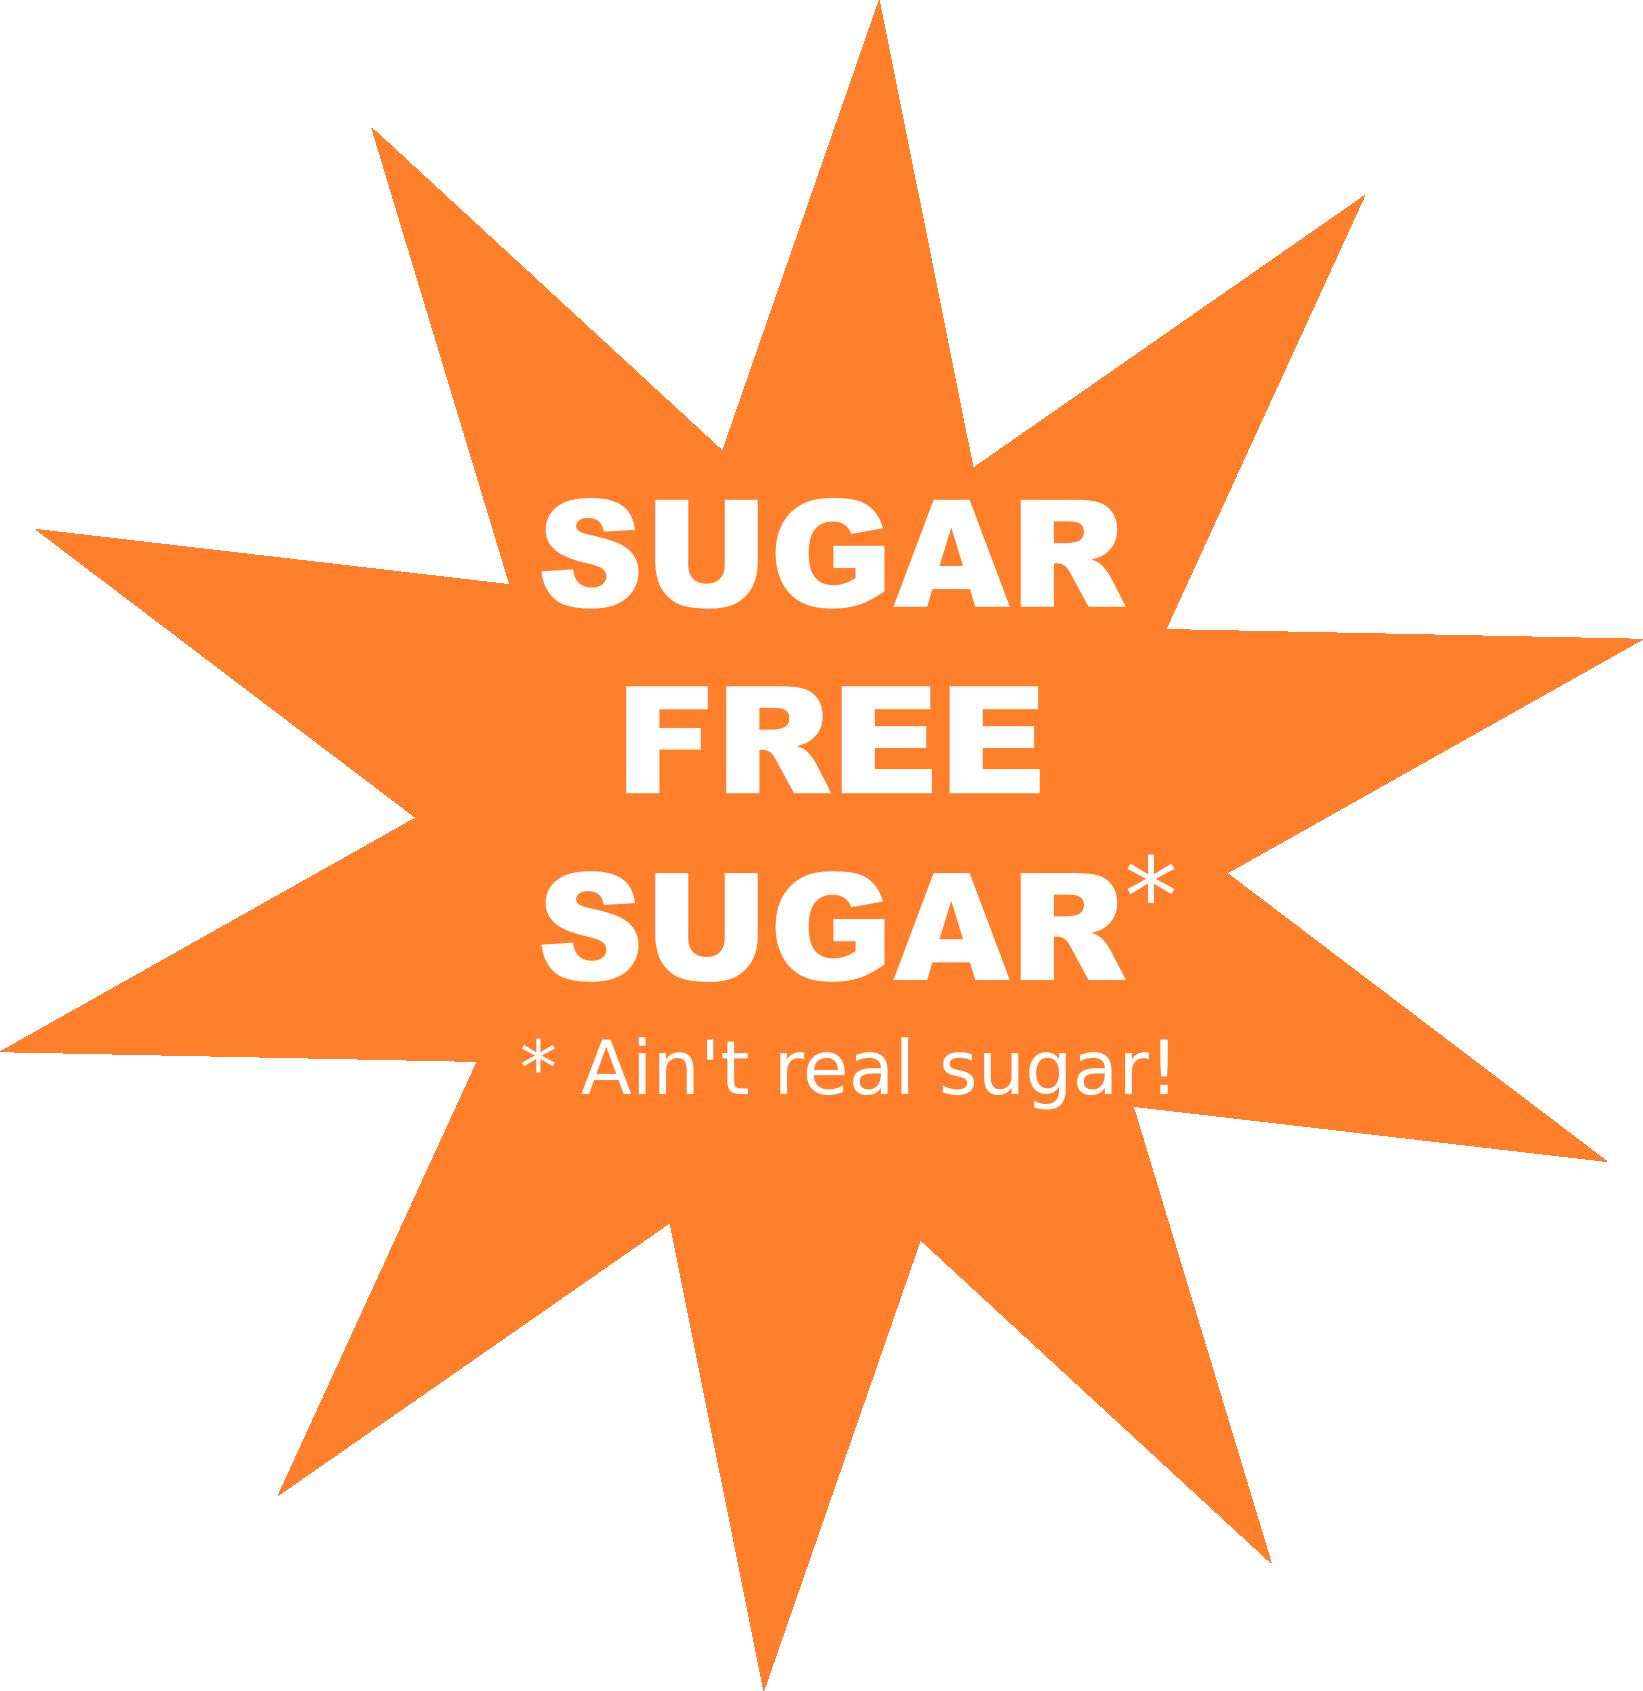 Sugar free sugar ain't real sugar